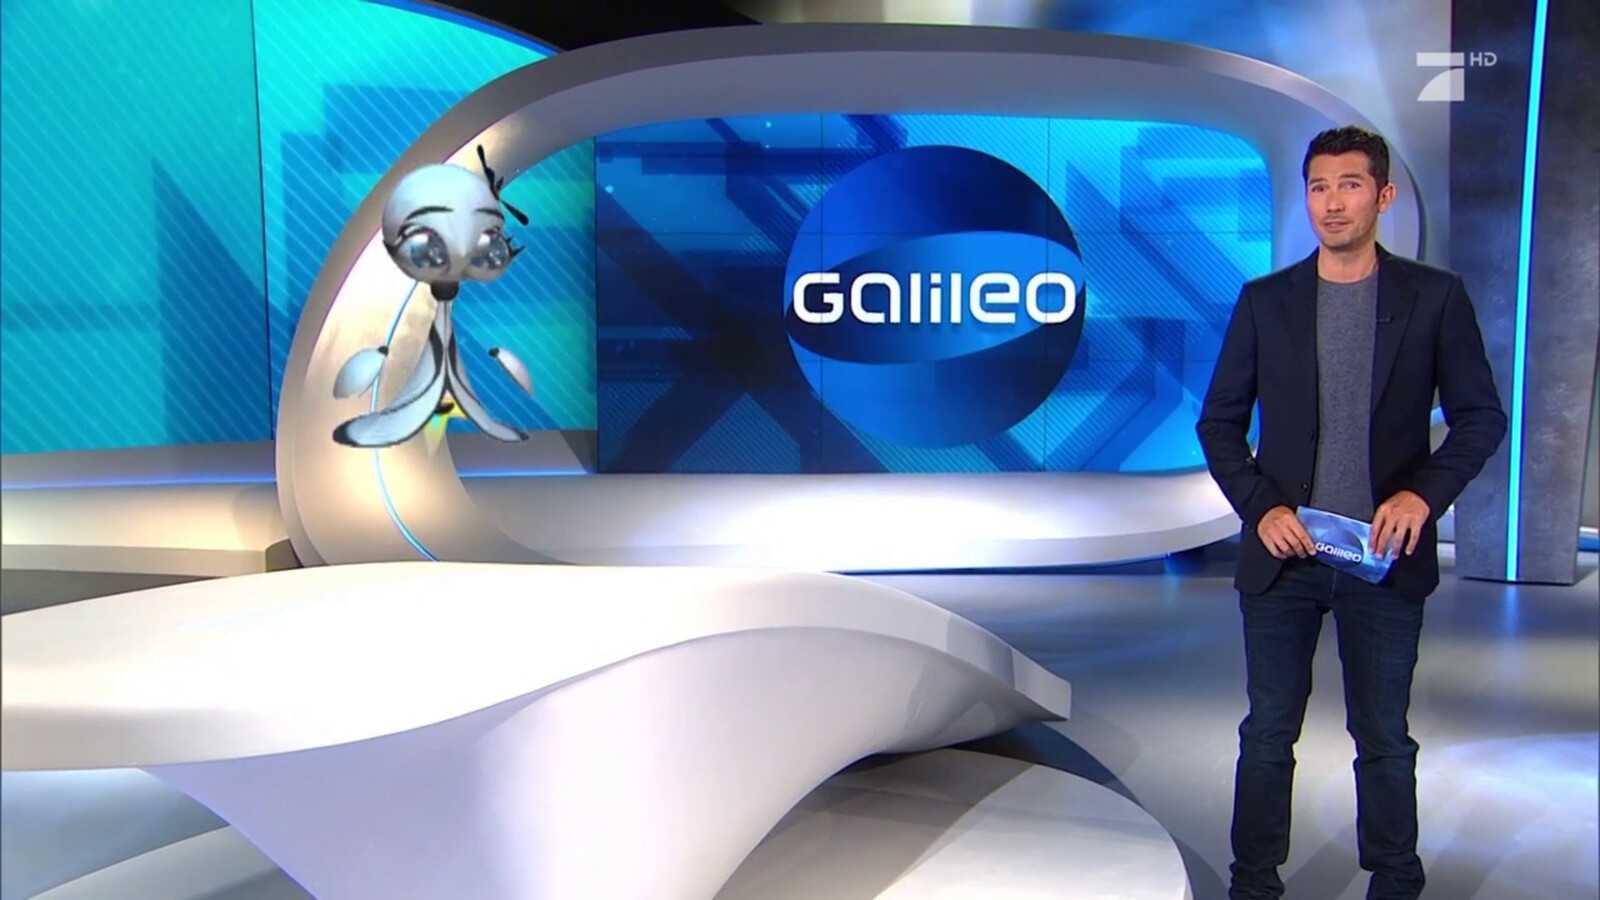 Paula's appearance on German TV